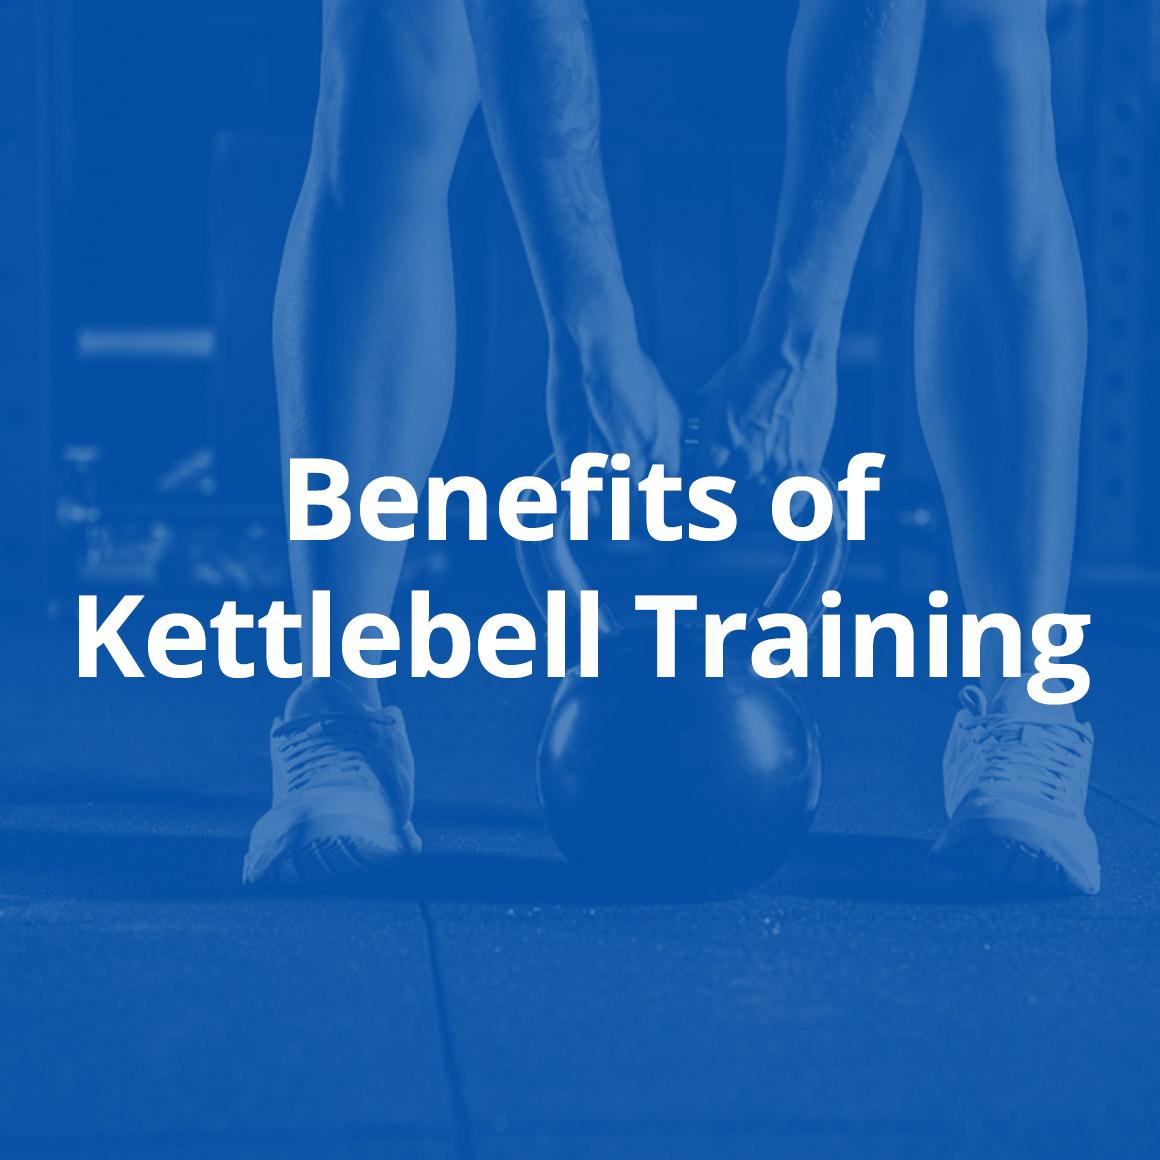 benefits-of-kettlebell-training